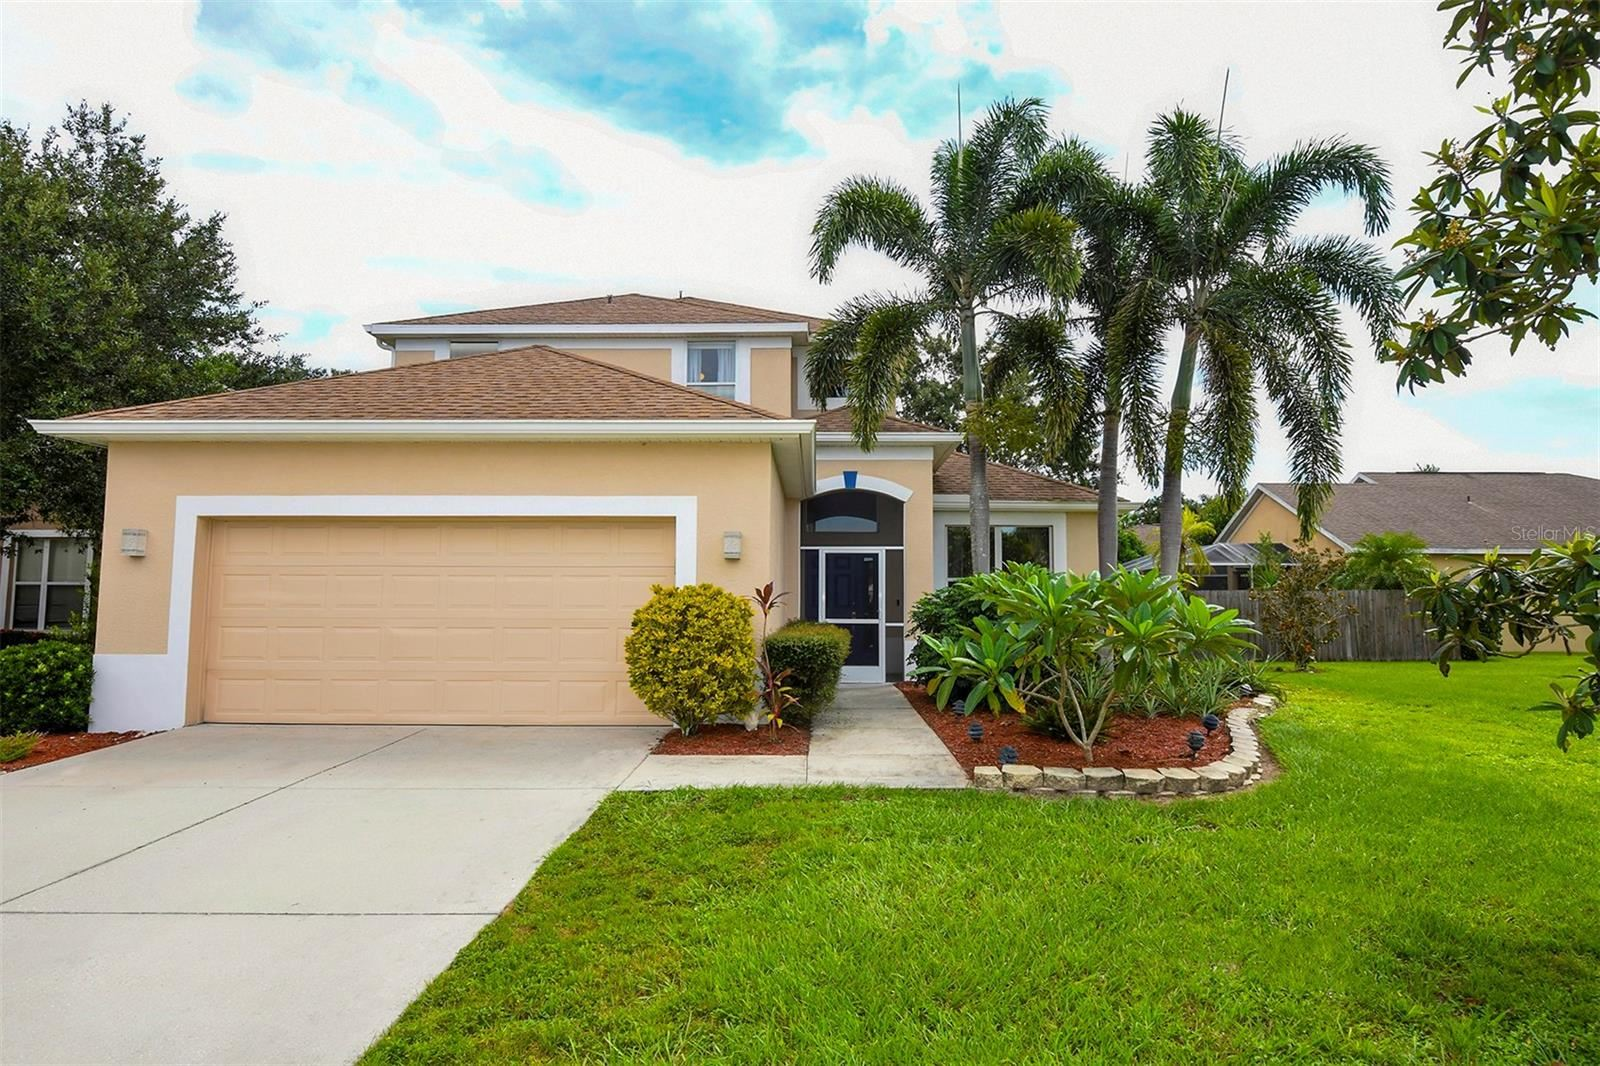 5409 NEW COVINGTON DRIVE, Sarasota, FL 34233 - #: A4512956